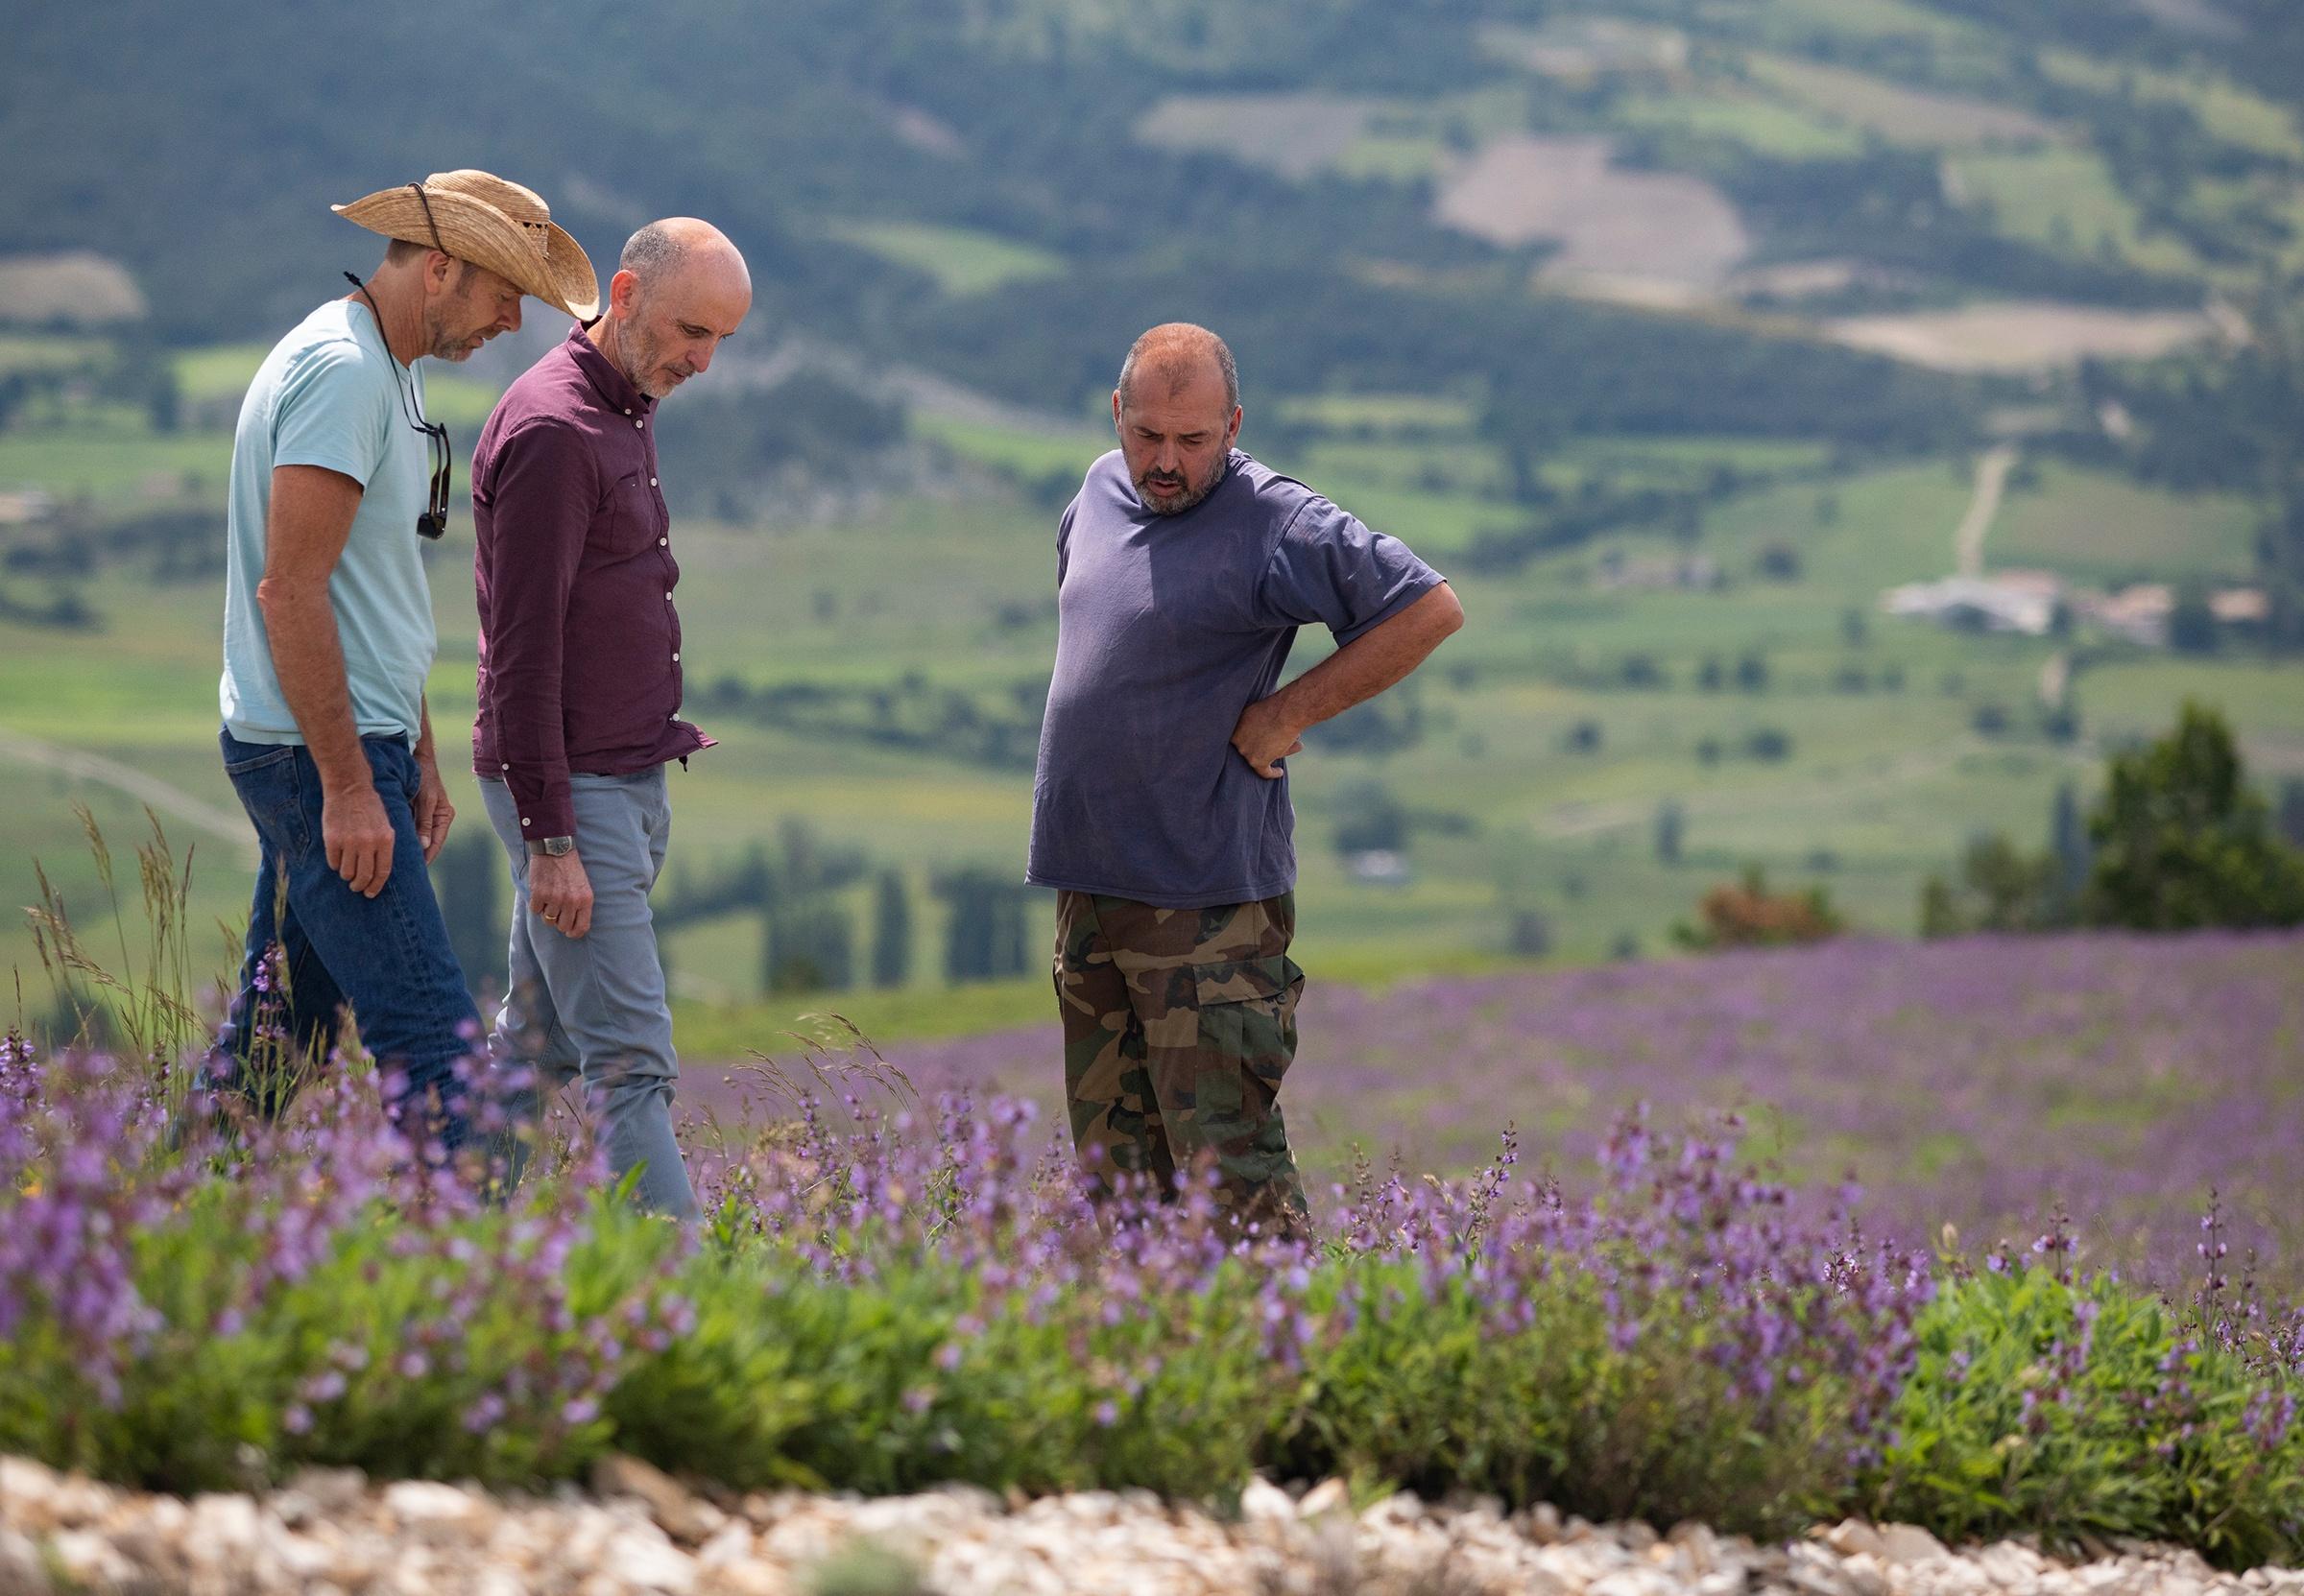 Three men looking at flowering sage plants on a hillside in Europe